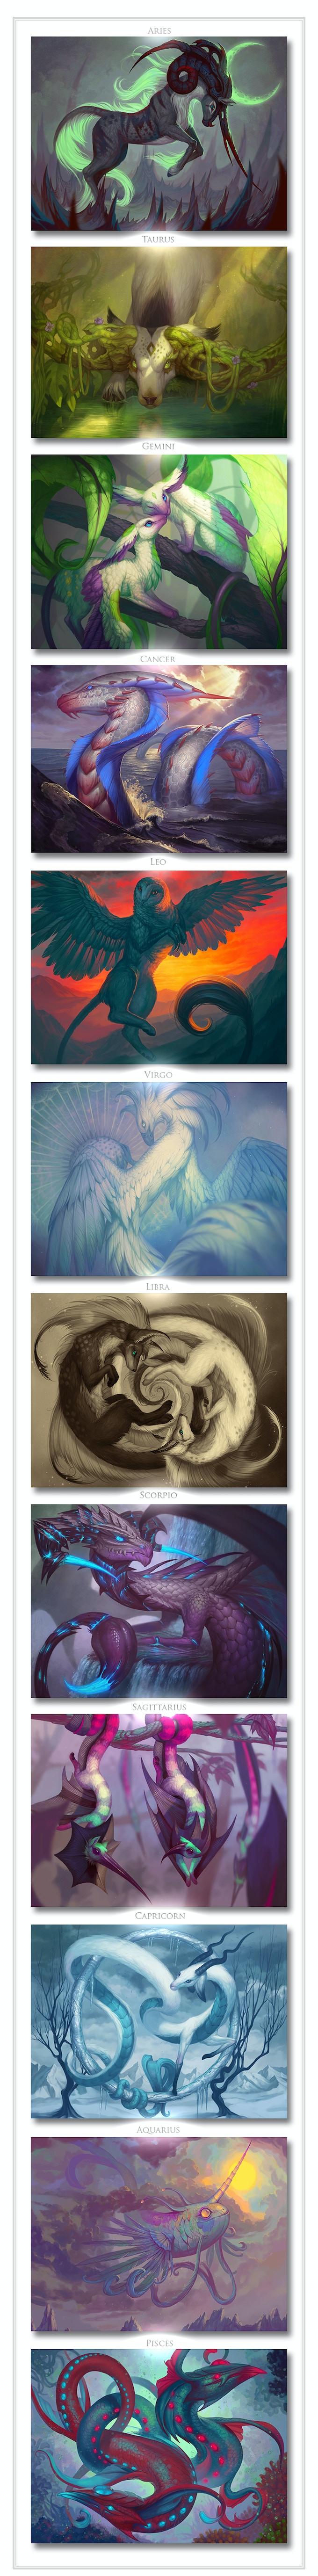 Zodiac Creatures 2020 Art Calendar